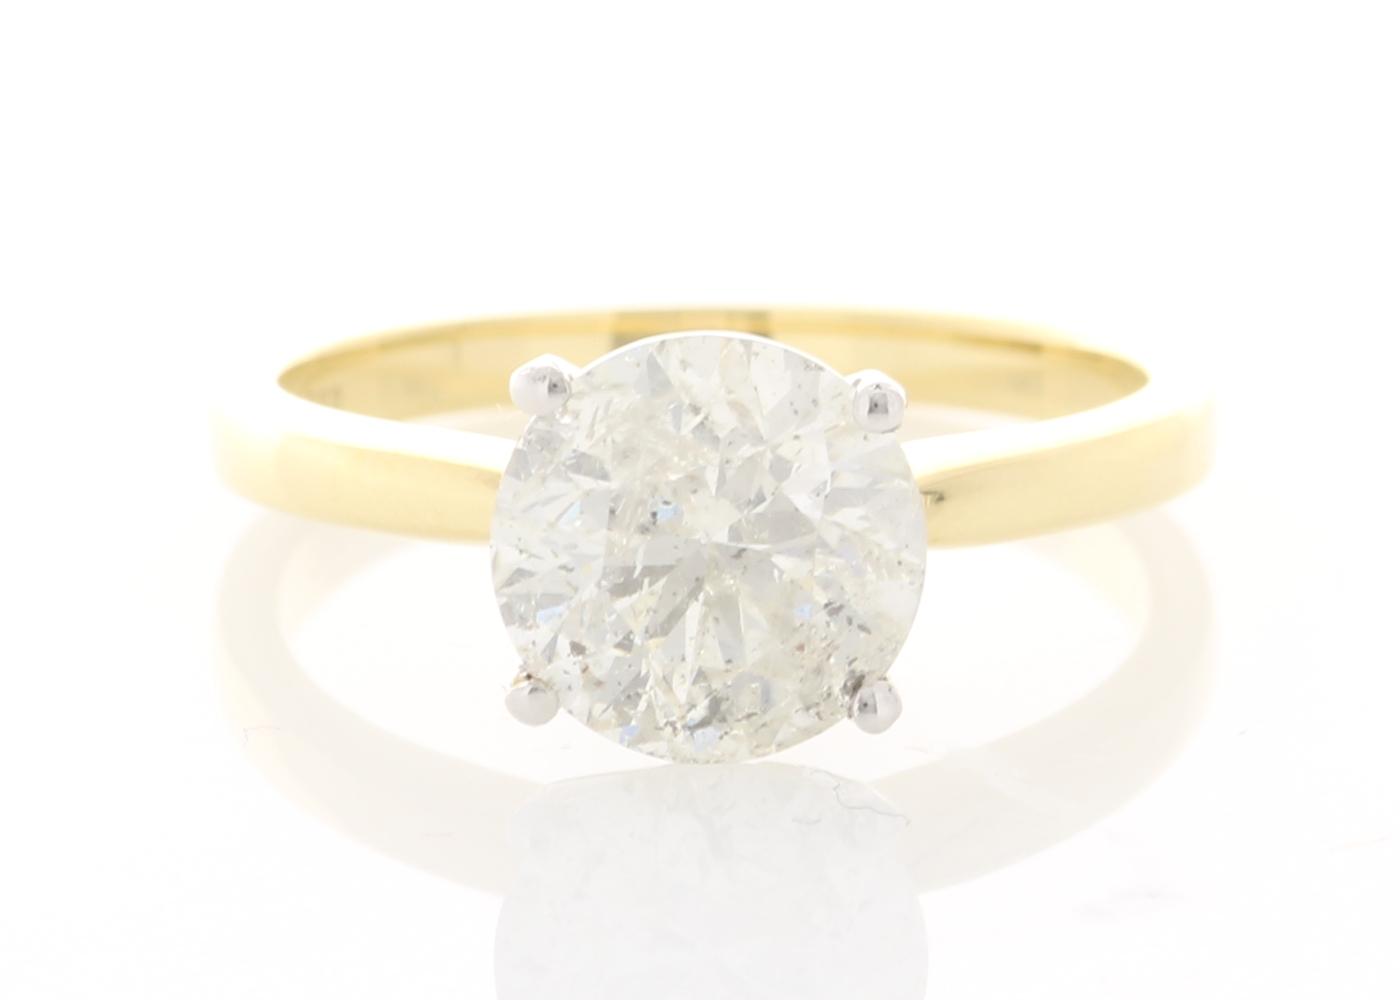 18ct Yellow Gold Prong Set Diamond Ring 2.21 Carats